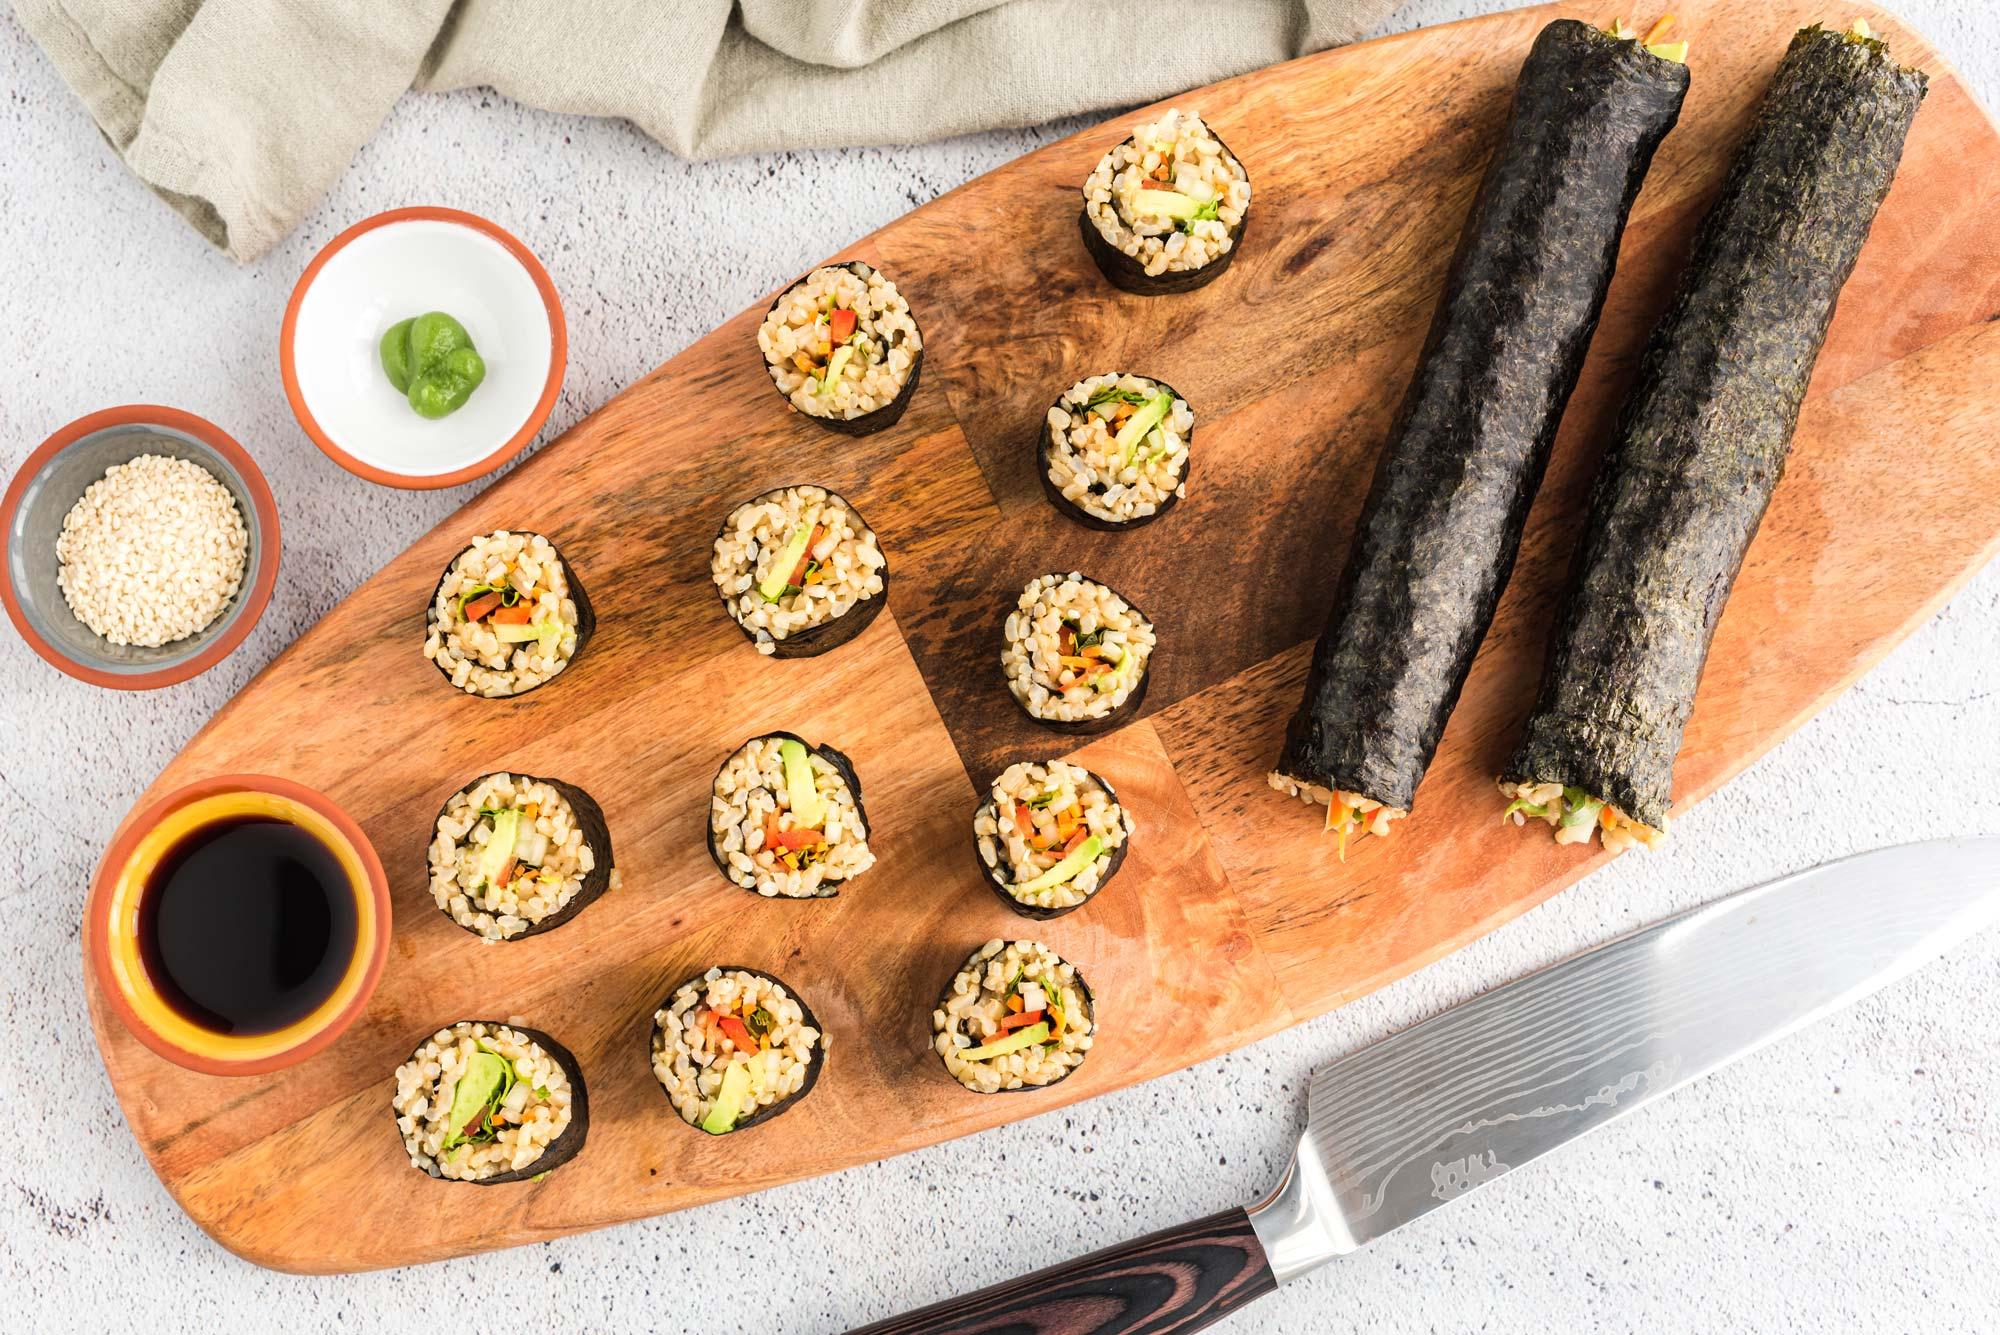 veggie nori rolls on cutting board